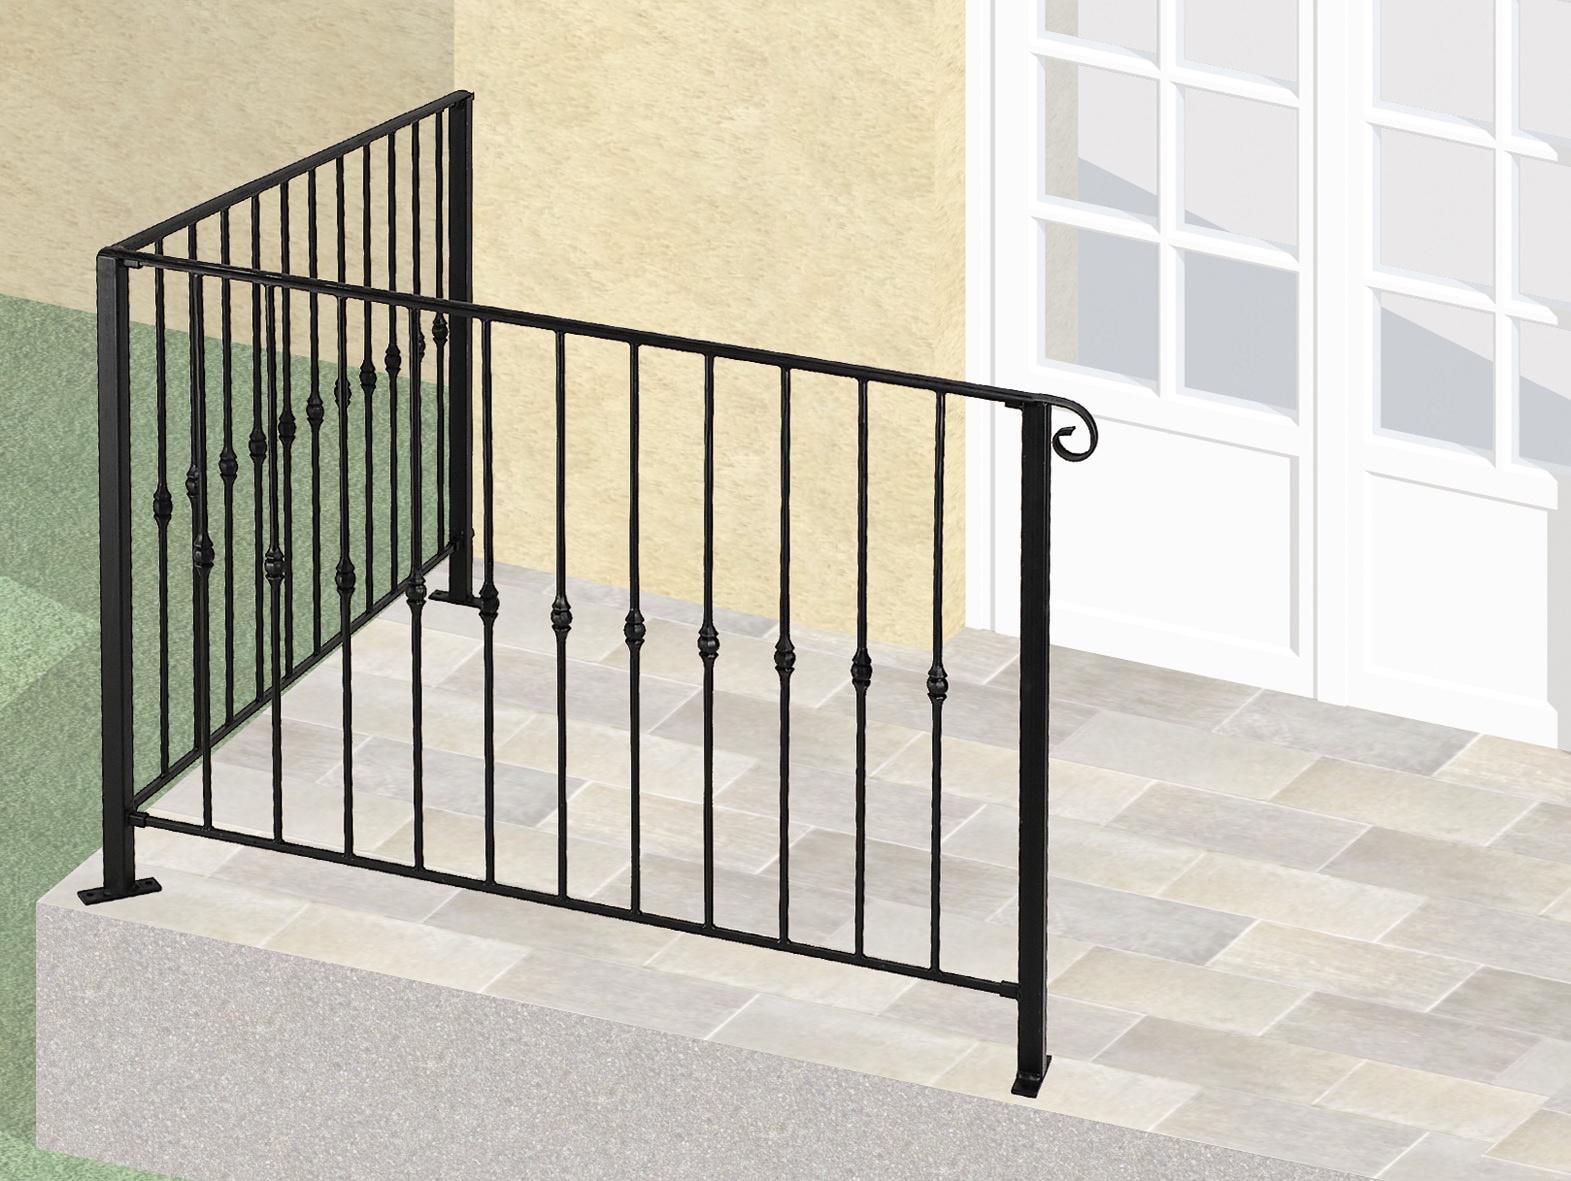 Le ferronnier balcon en fer forg dominique gcdominique - Barriere de terrasse en fer ...